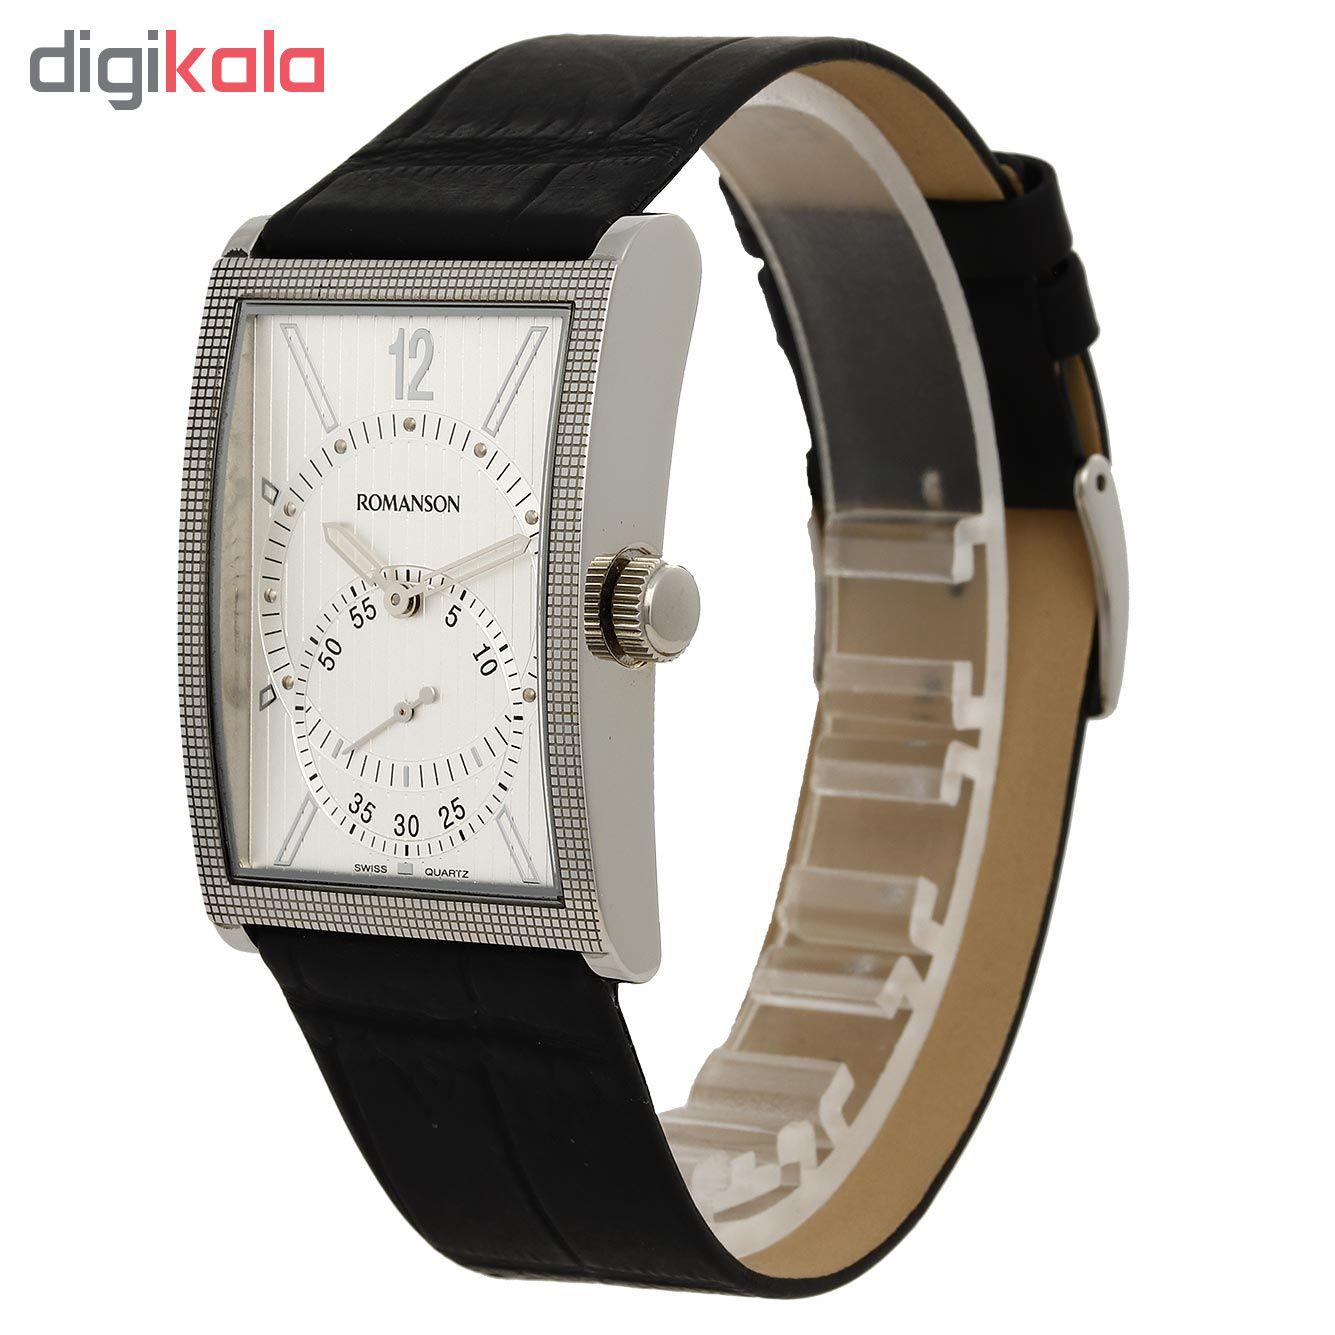 ساعت مچی عقربه ای مردانه رومانسون مدل DL5146MM1WAS2W